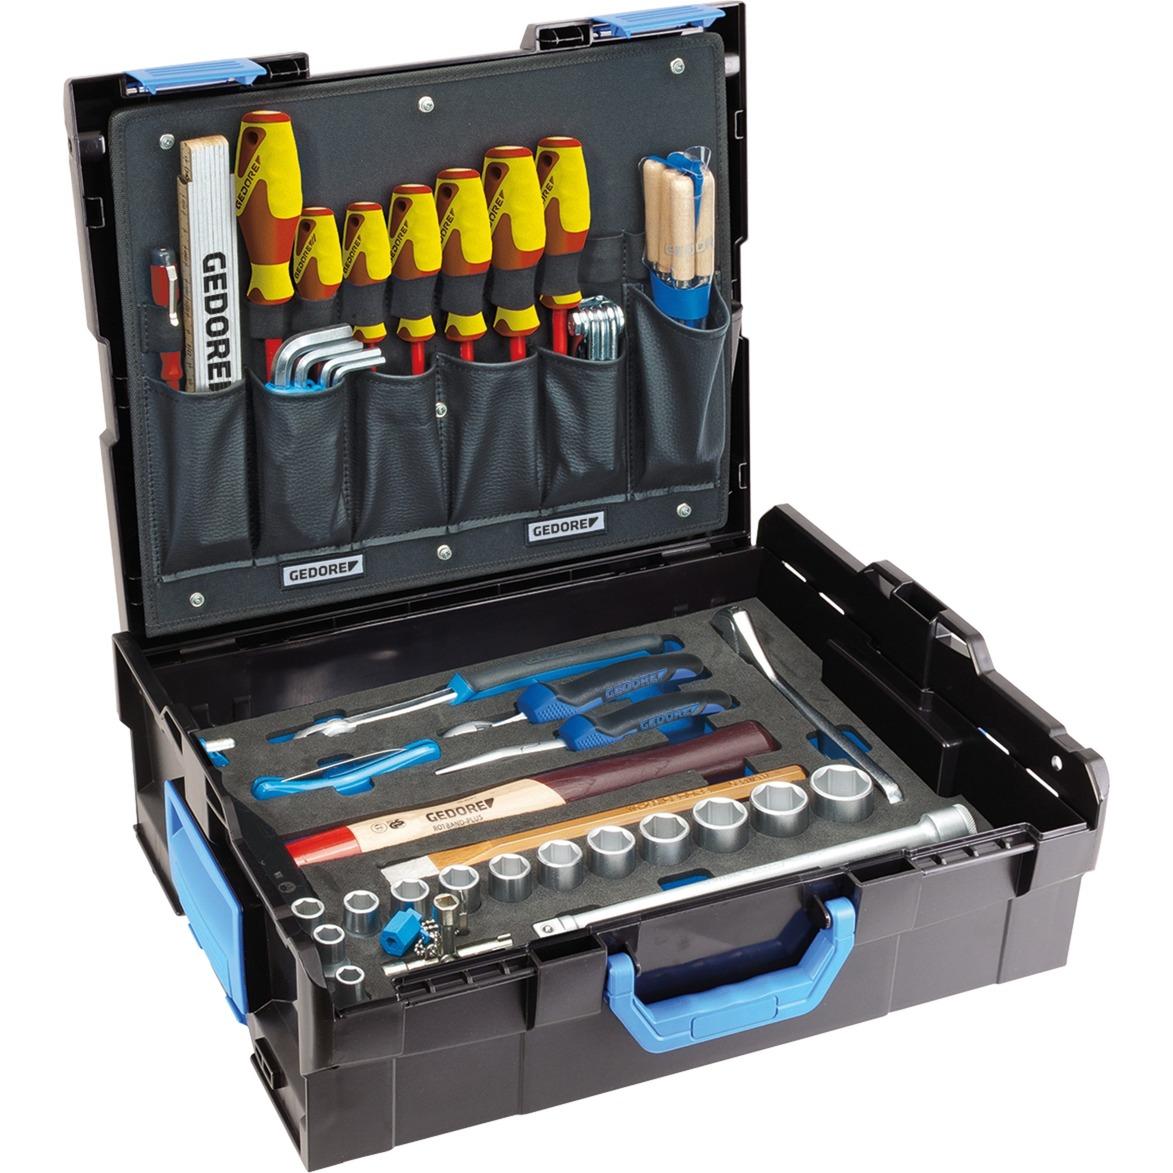 2658194, Kit de herramientas